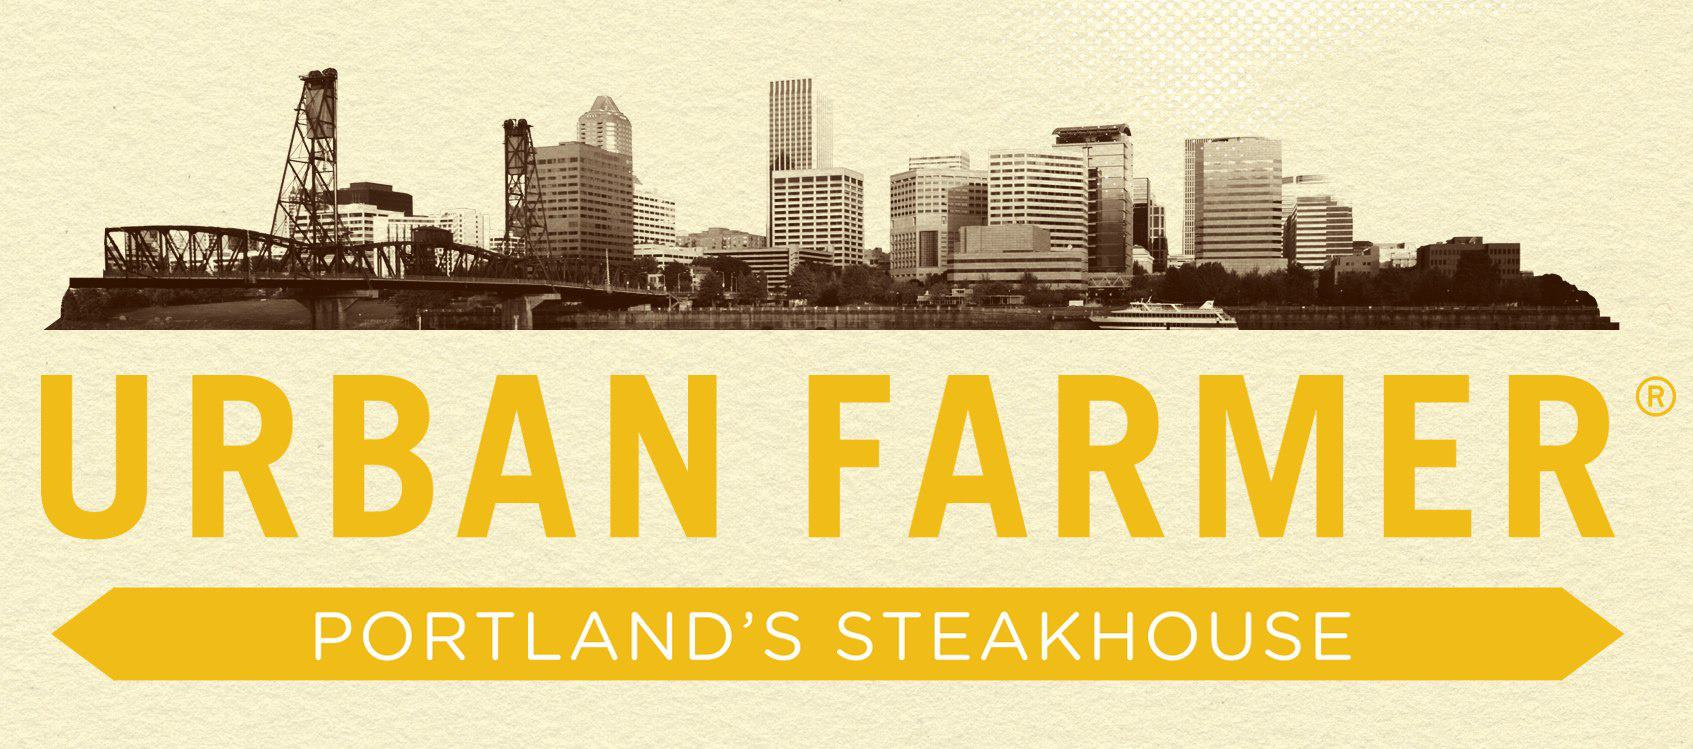 Urban Farmer Portland's Steakhouse